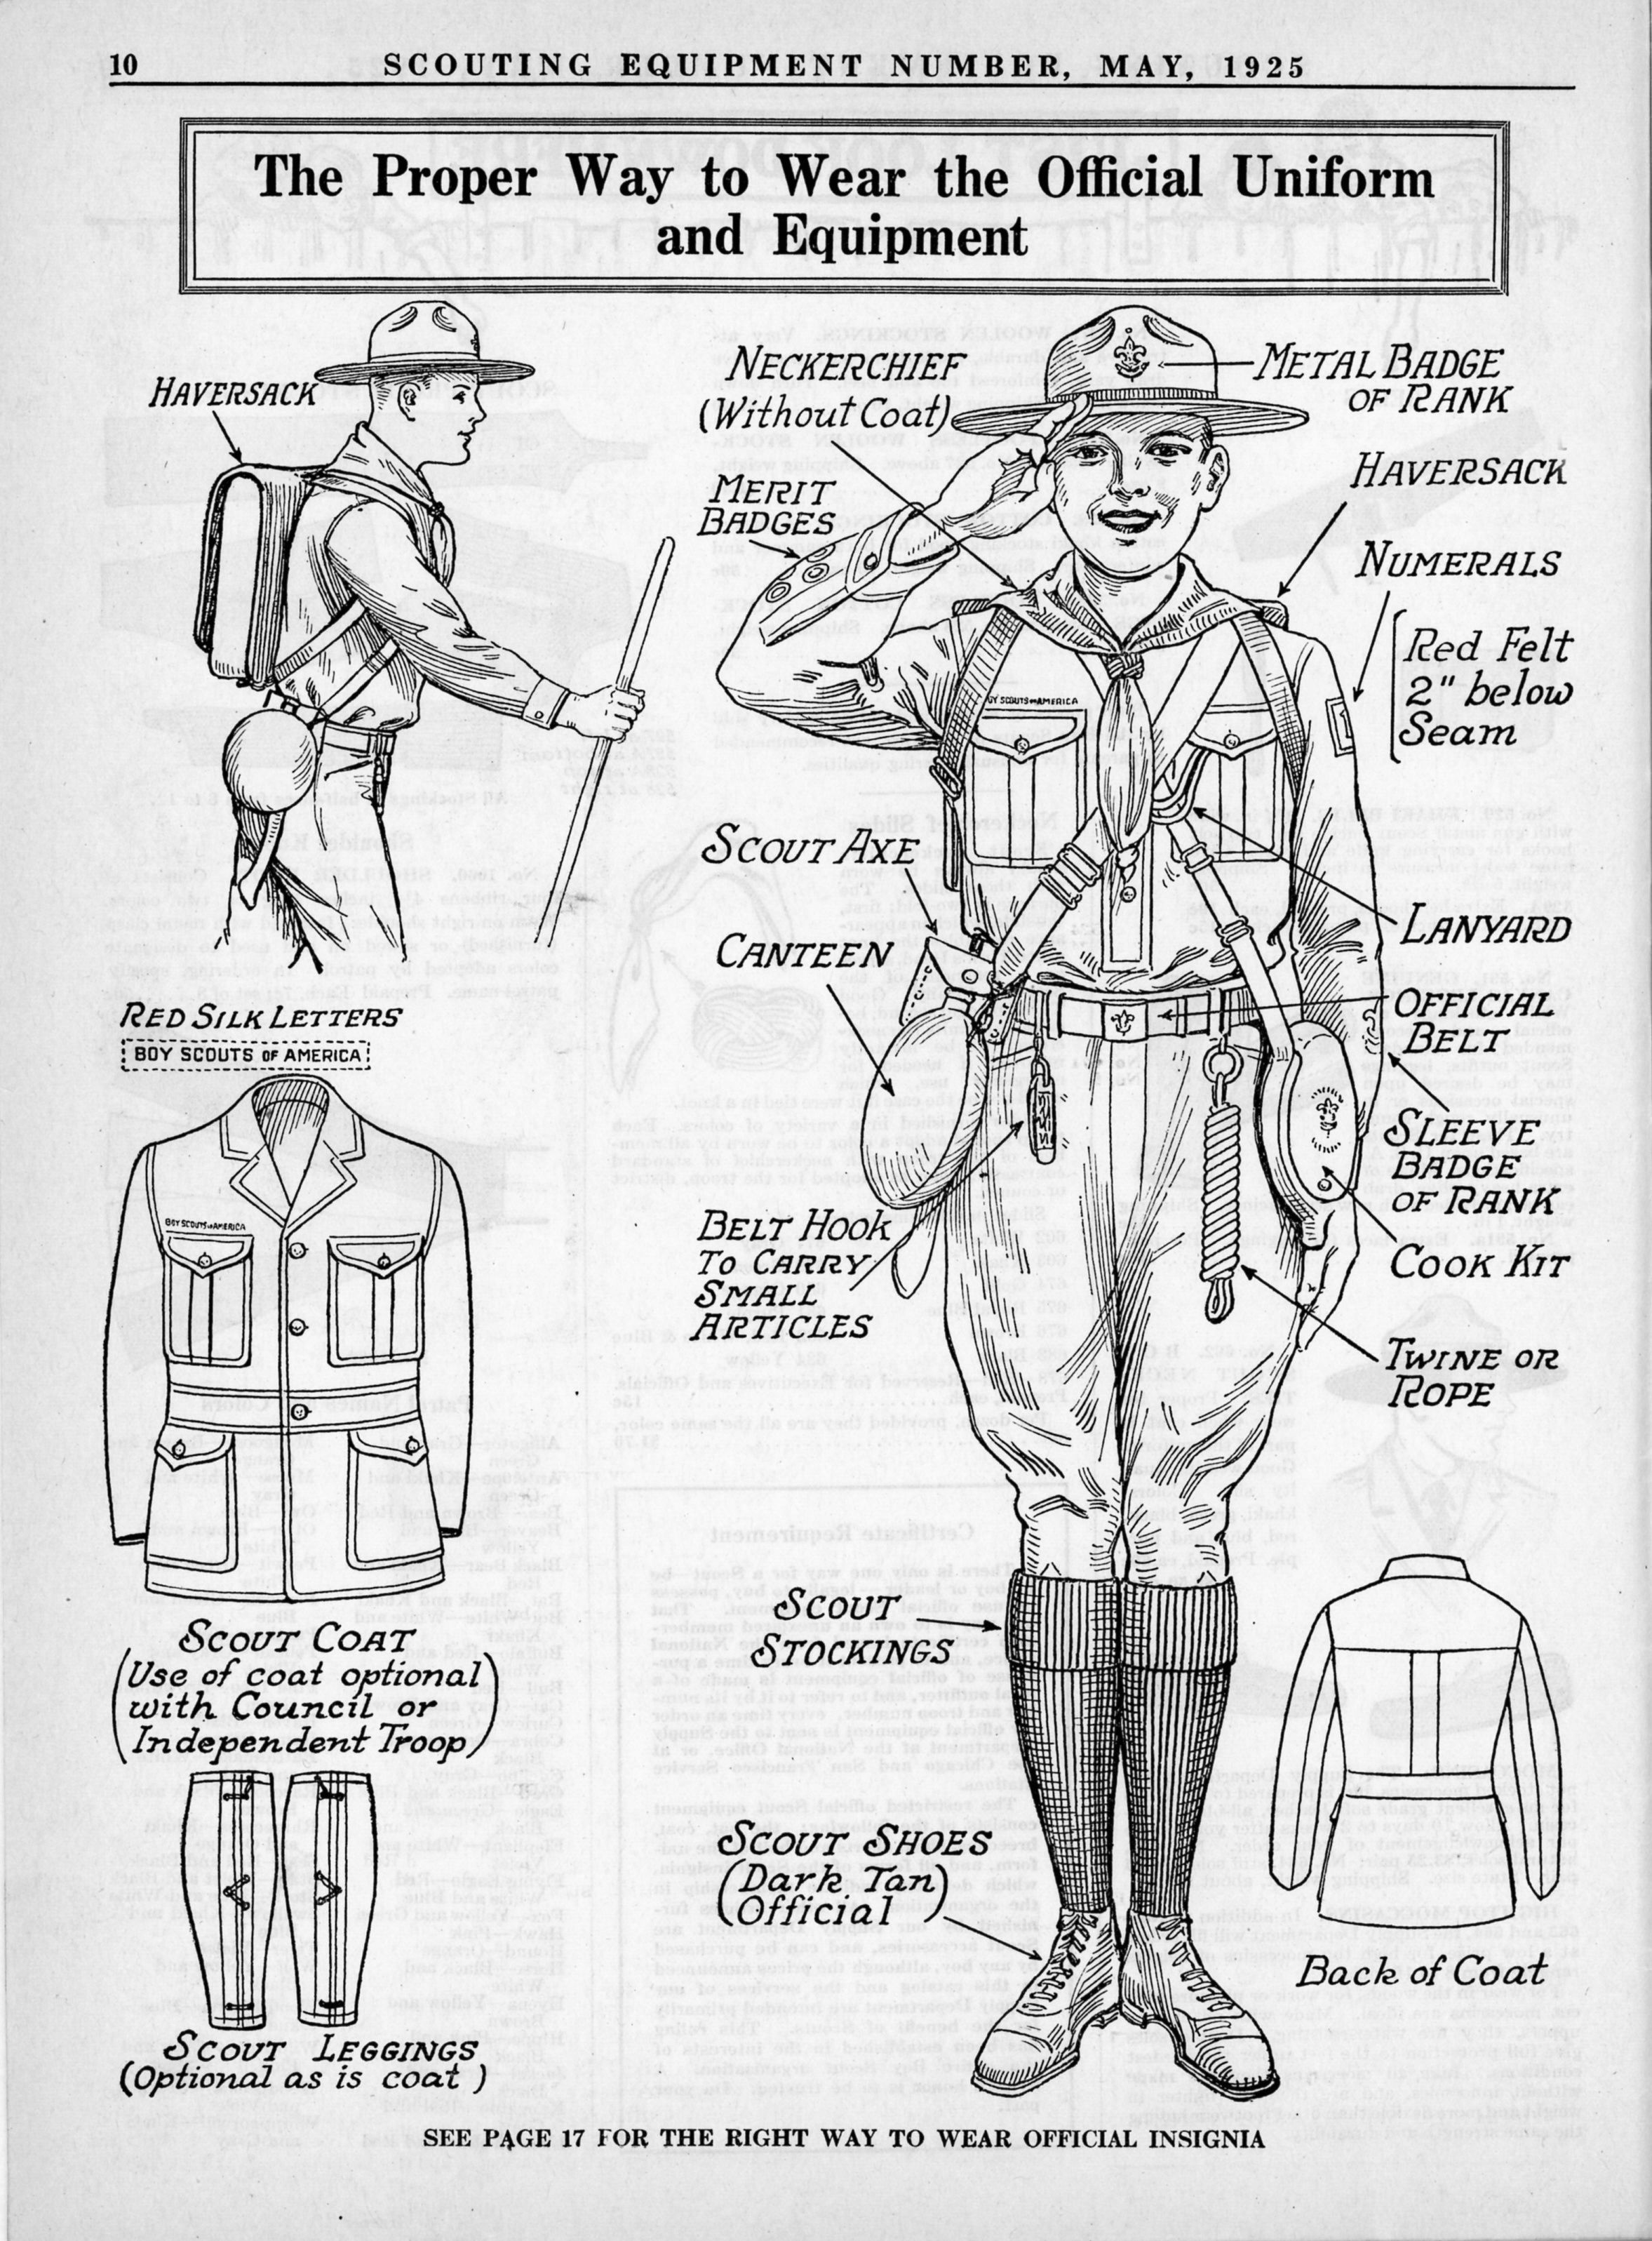 1925 Scouting Equipment Catalog Scoutmastercg Com